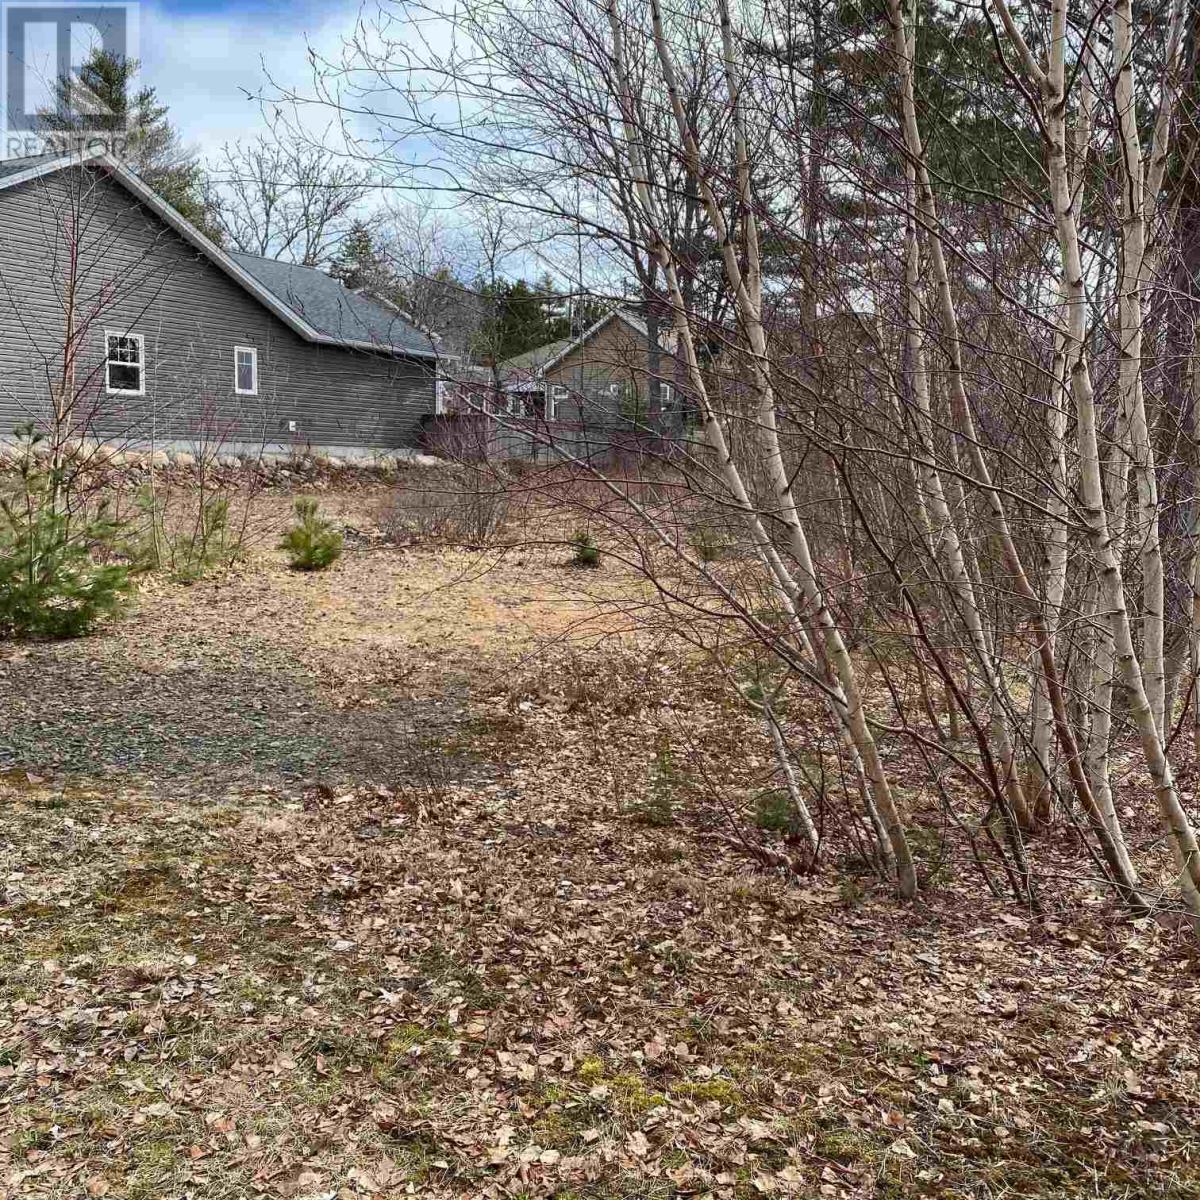 Lot 21 Acorn Drive, Bridgewater, Nova Scotia  B4V 8Z1 - Photo 1 - 201711031